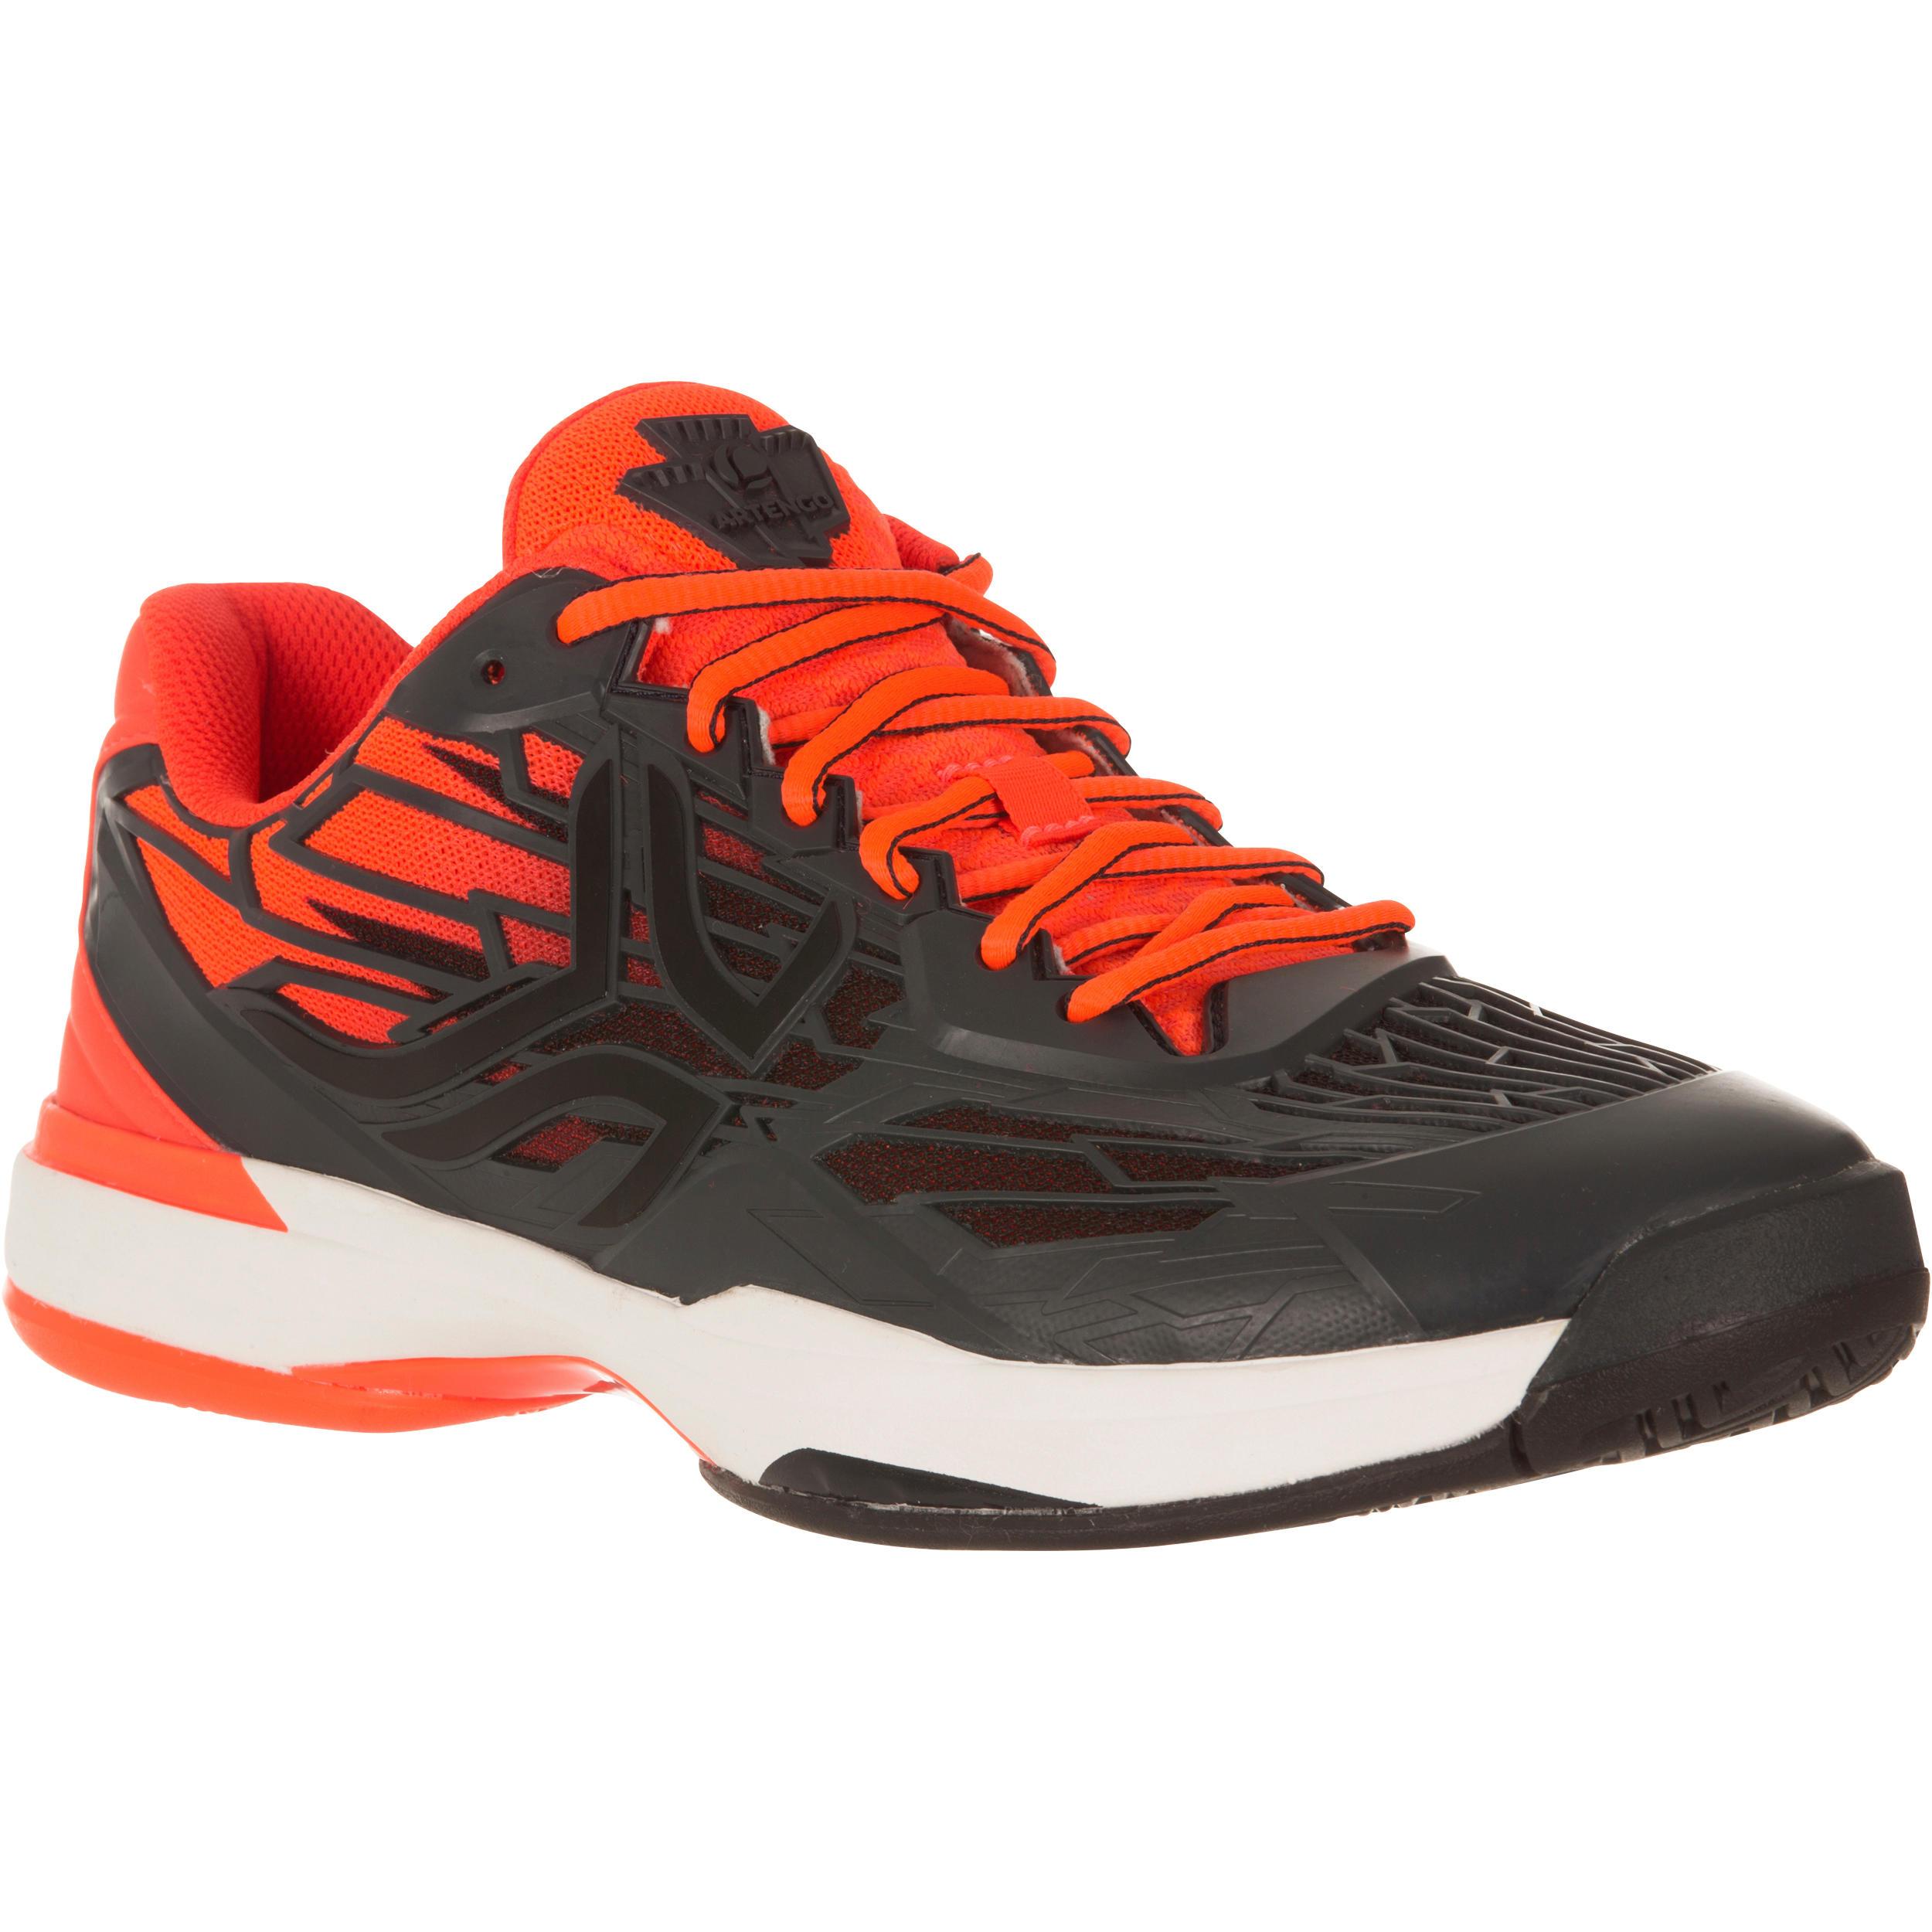 Artengo Tennisschoenen heren TS990